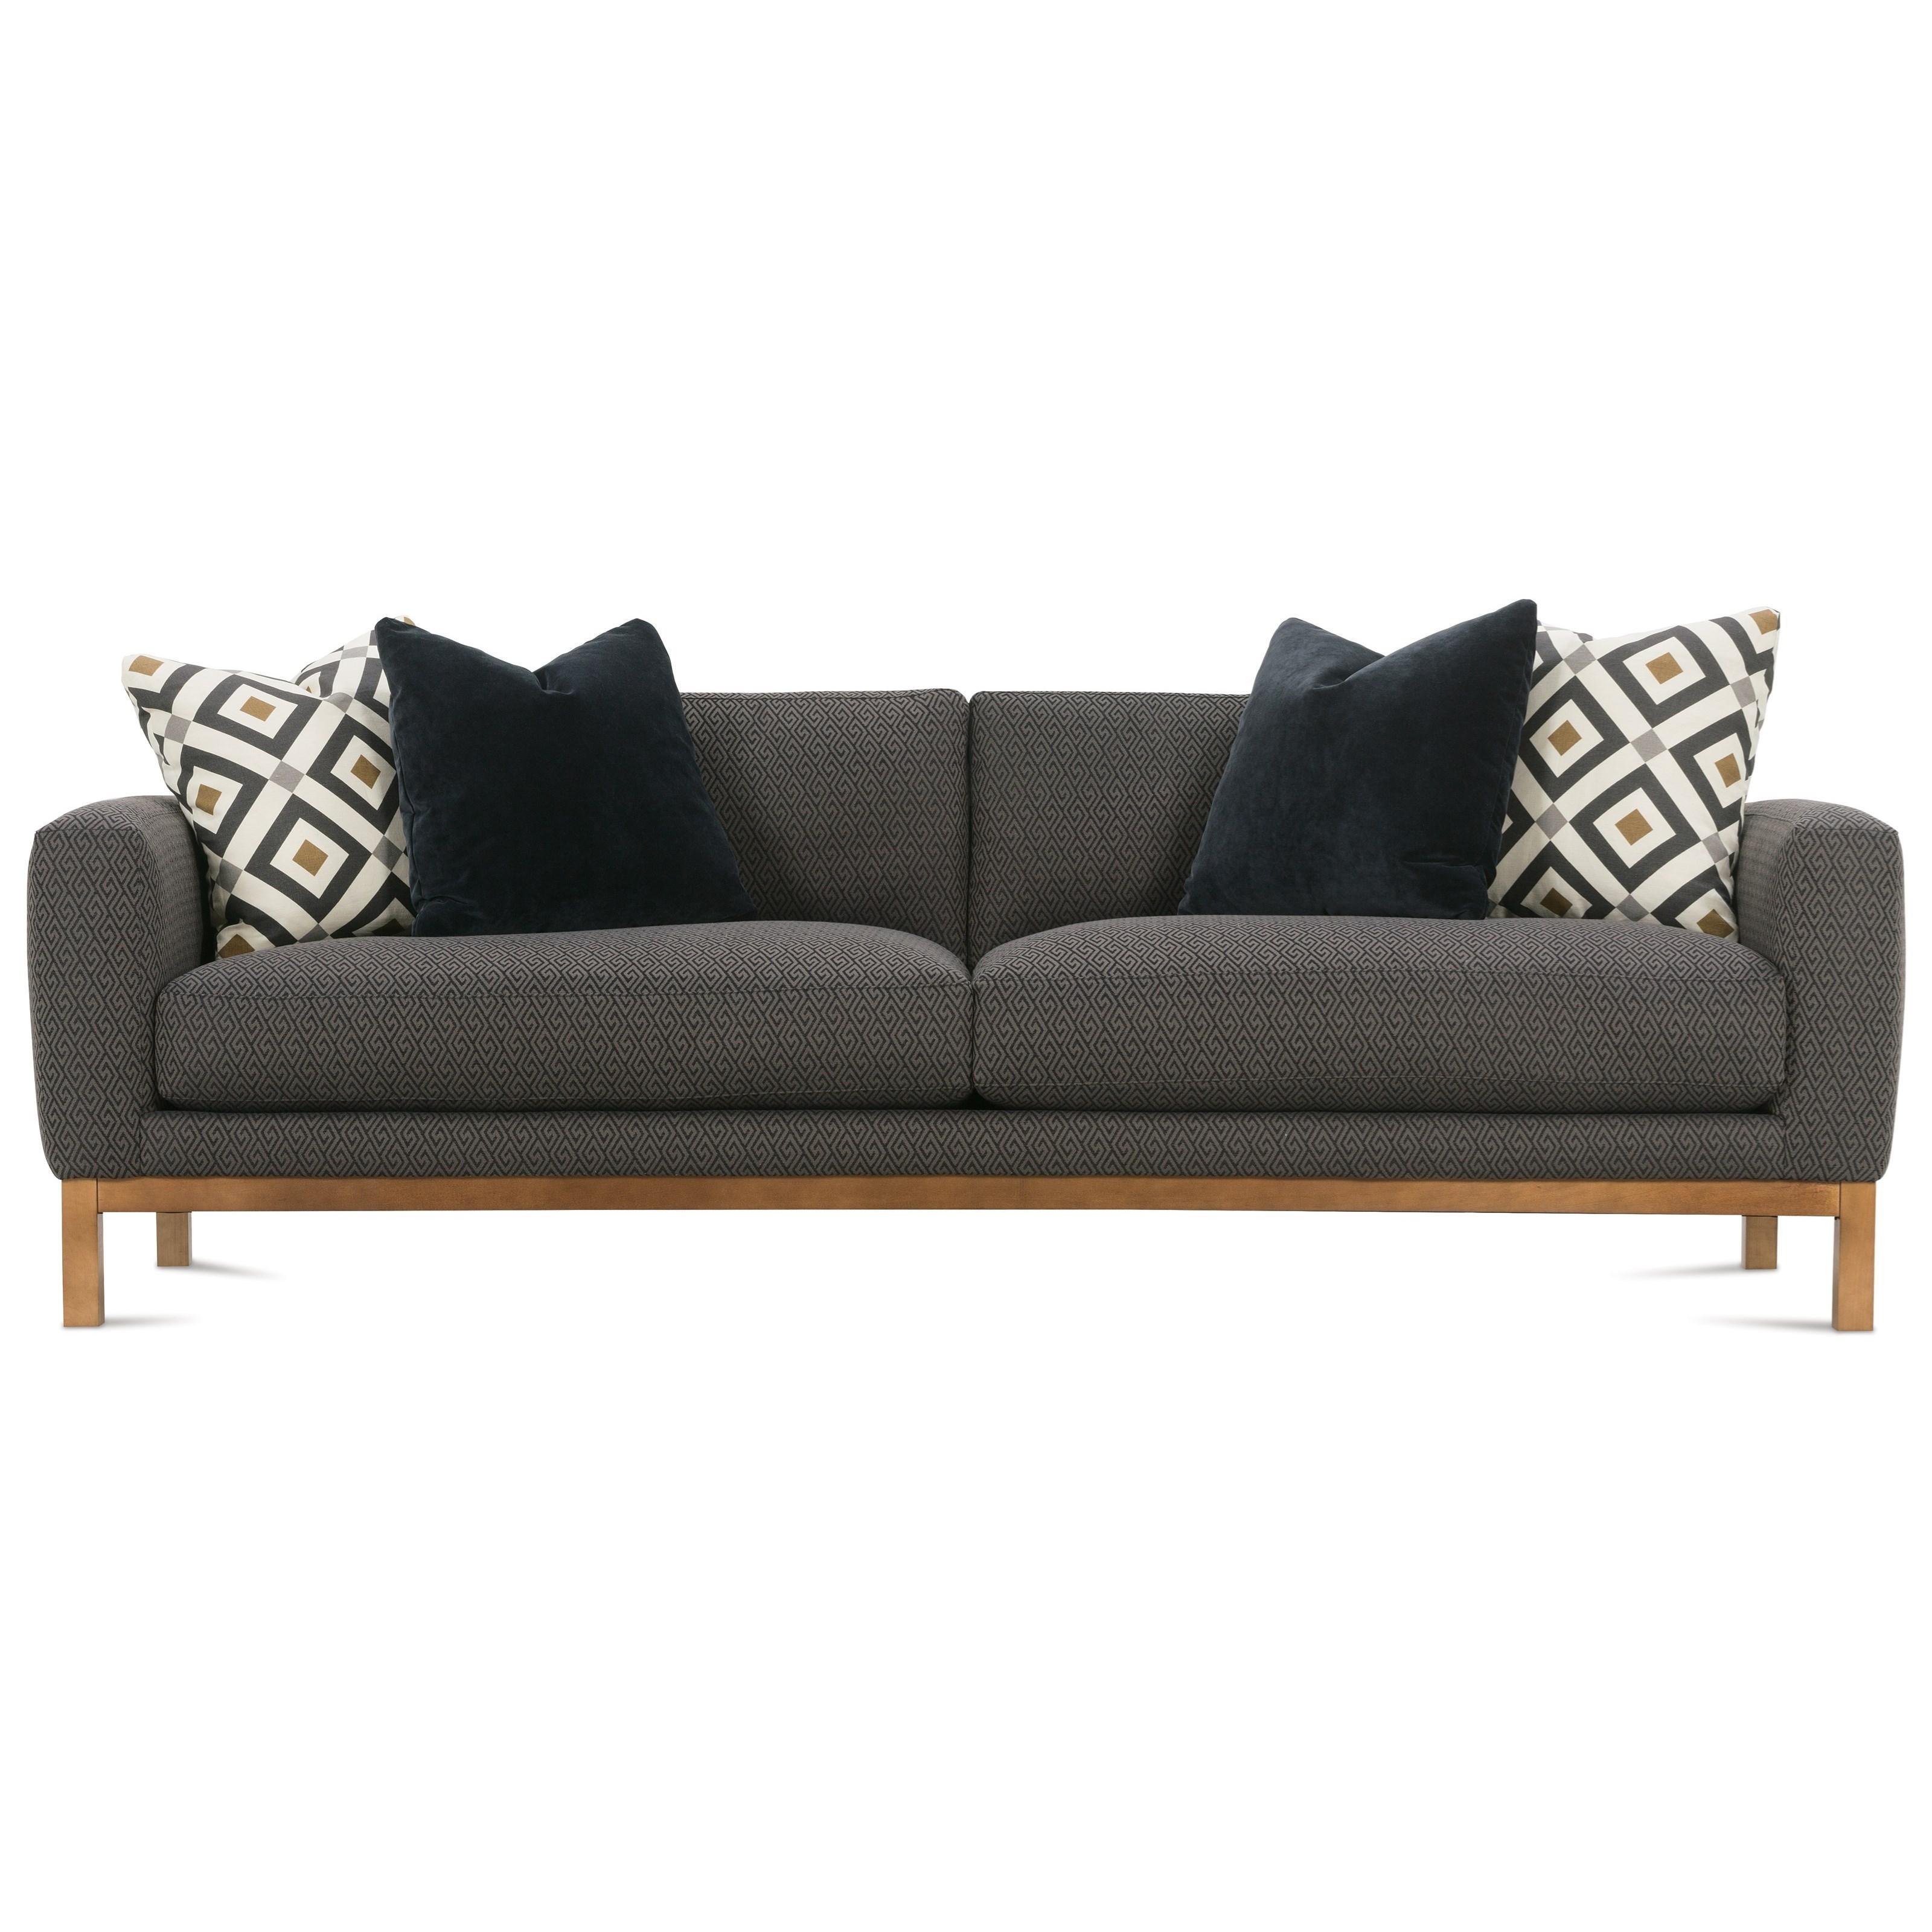 Contemporary Wood Sofa. Contemporary Wood Sofa M